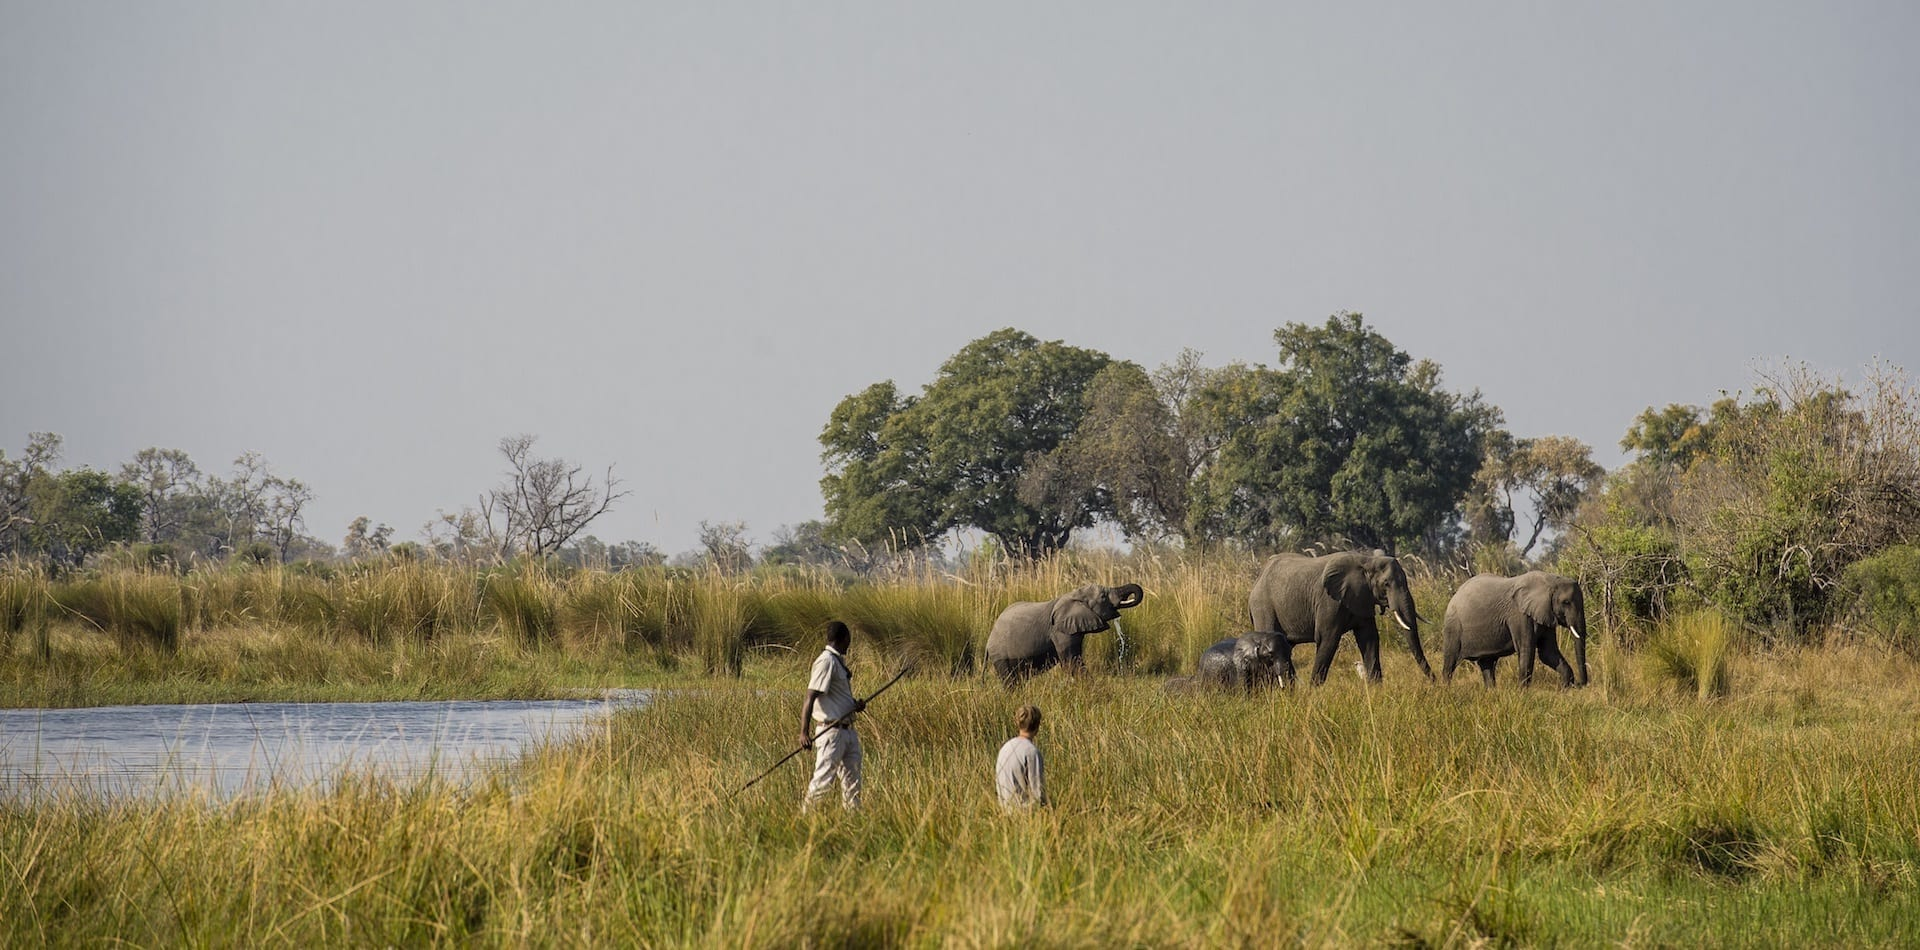 a couple of safari rangers within close proximity to 4 elephants